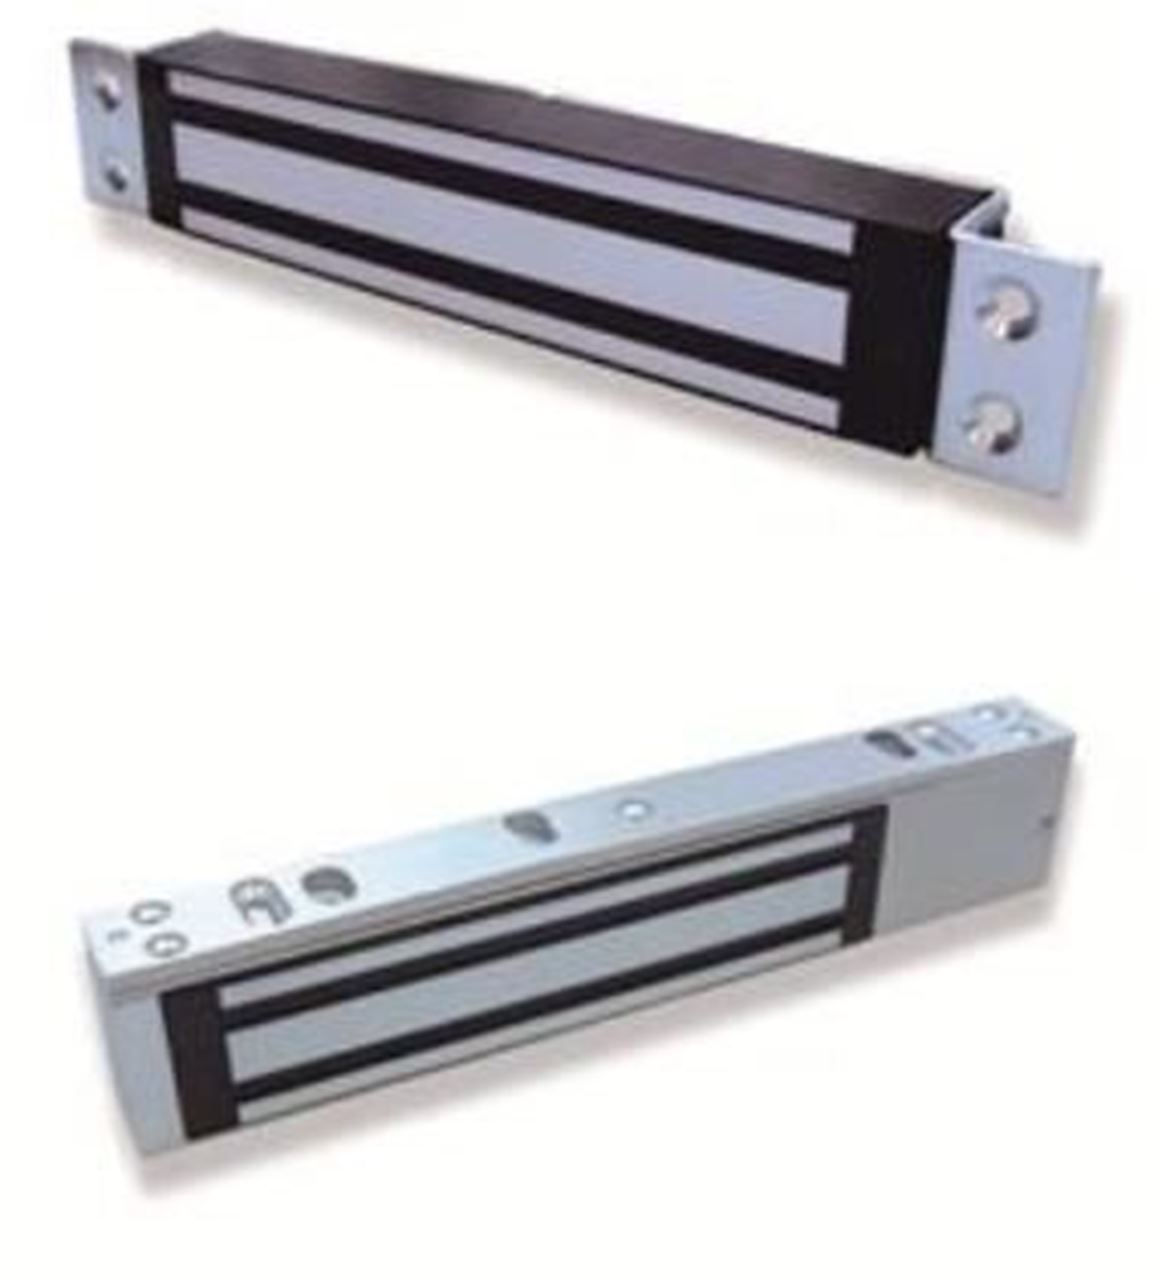 Assa Abloy Adams Rite Armlock 261 & 262 - Direct-Pull Magnets Armenia Vantag LLC